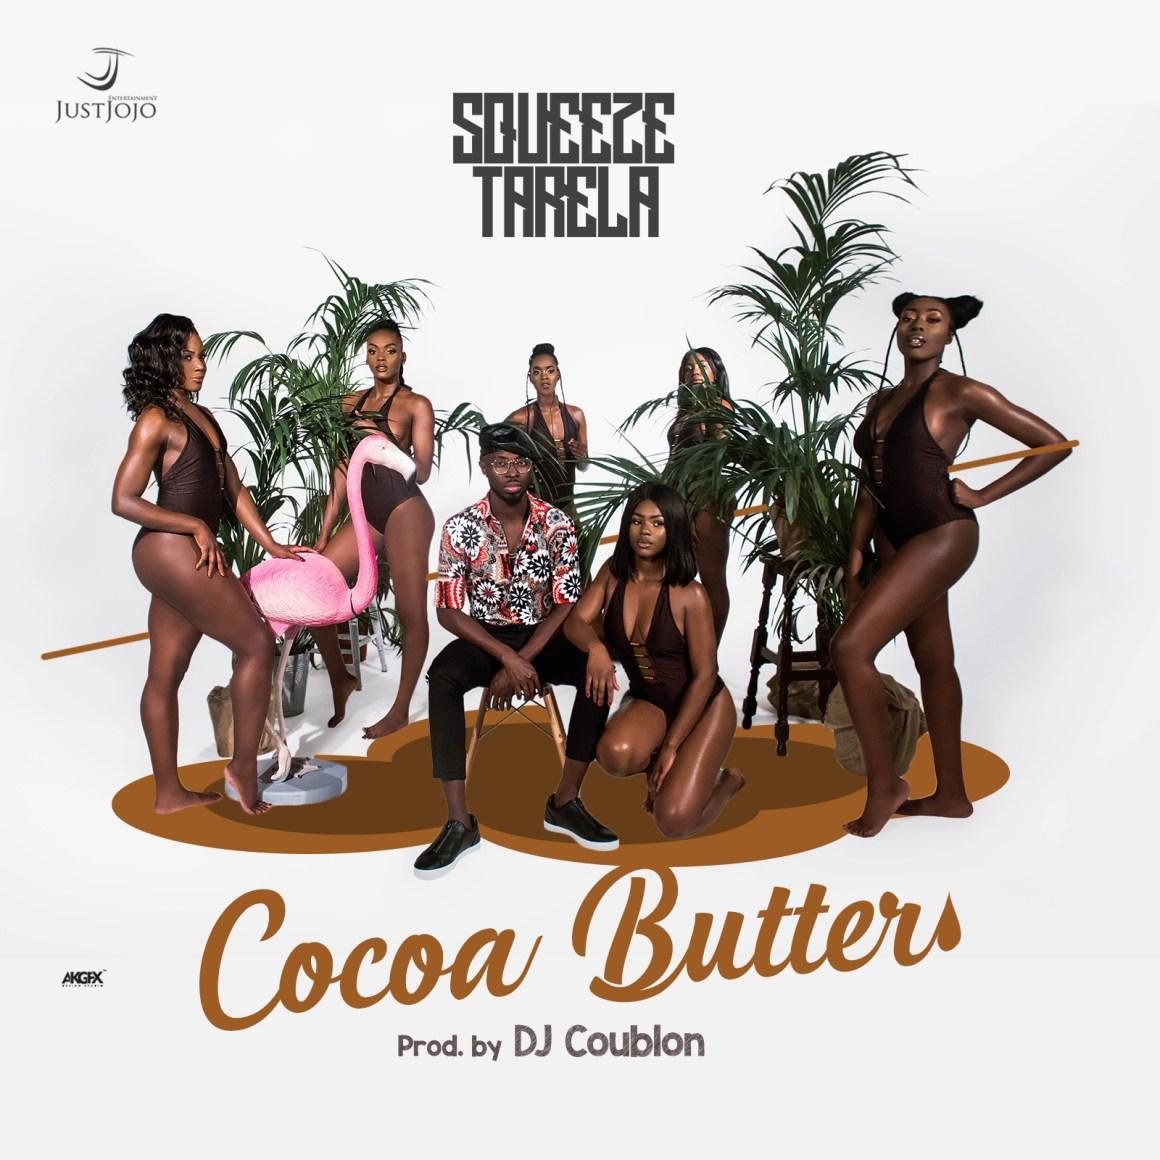 Squeeze-Tarela-Cocoa-Butter-mp3-image [Song] Squeeze Tarela | Cocoa Butter Audio